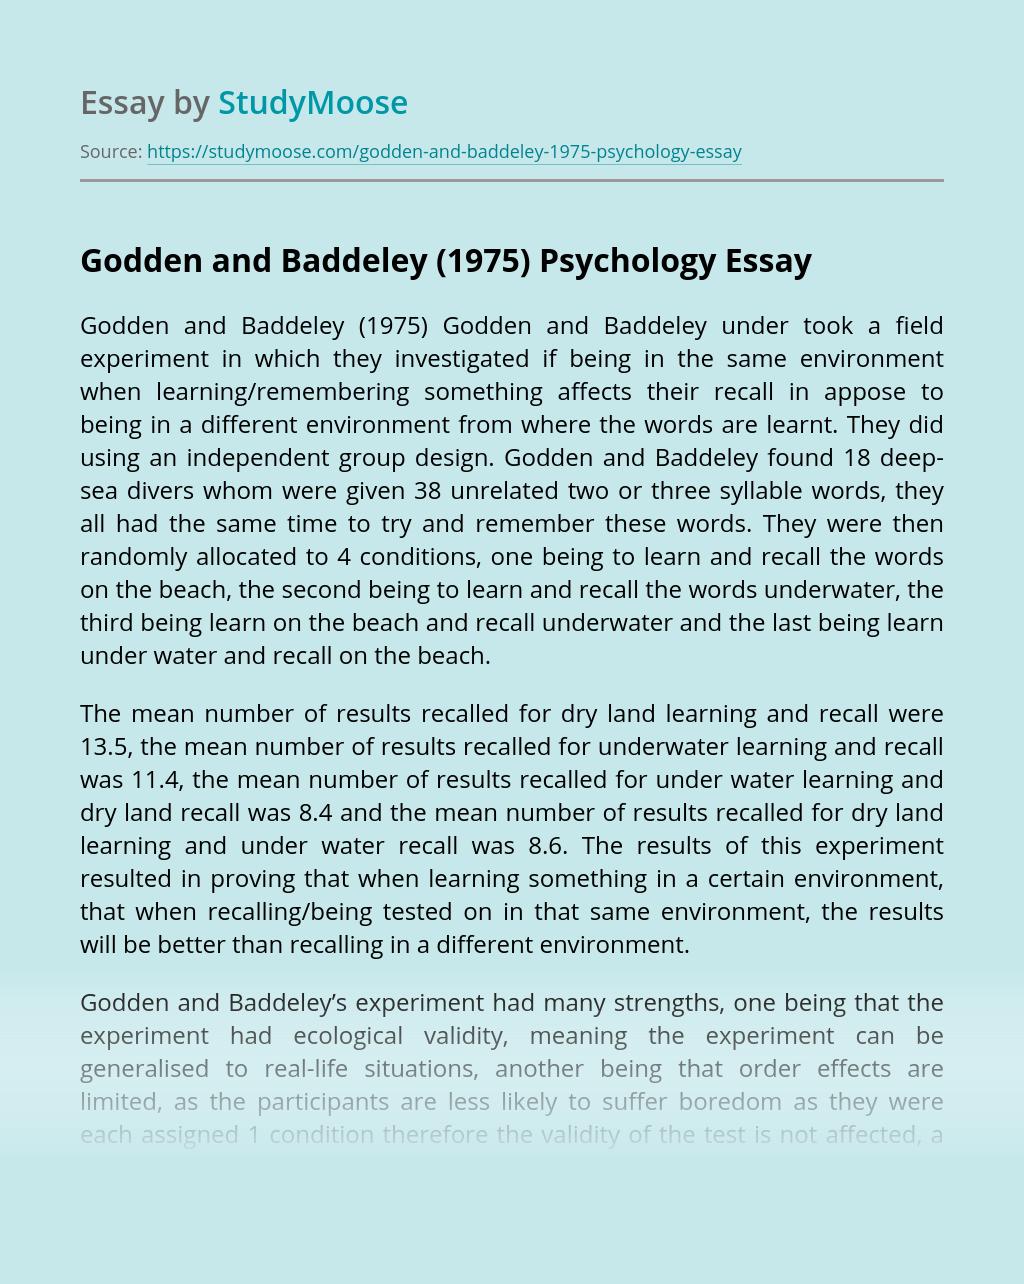 Godden and Baddeley (1975) Psychology